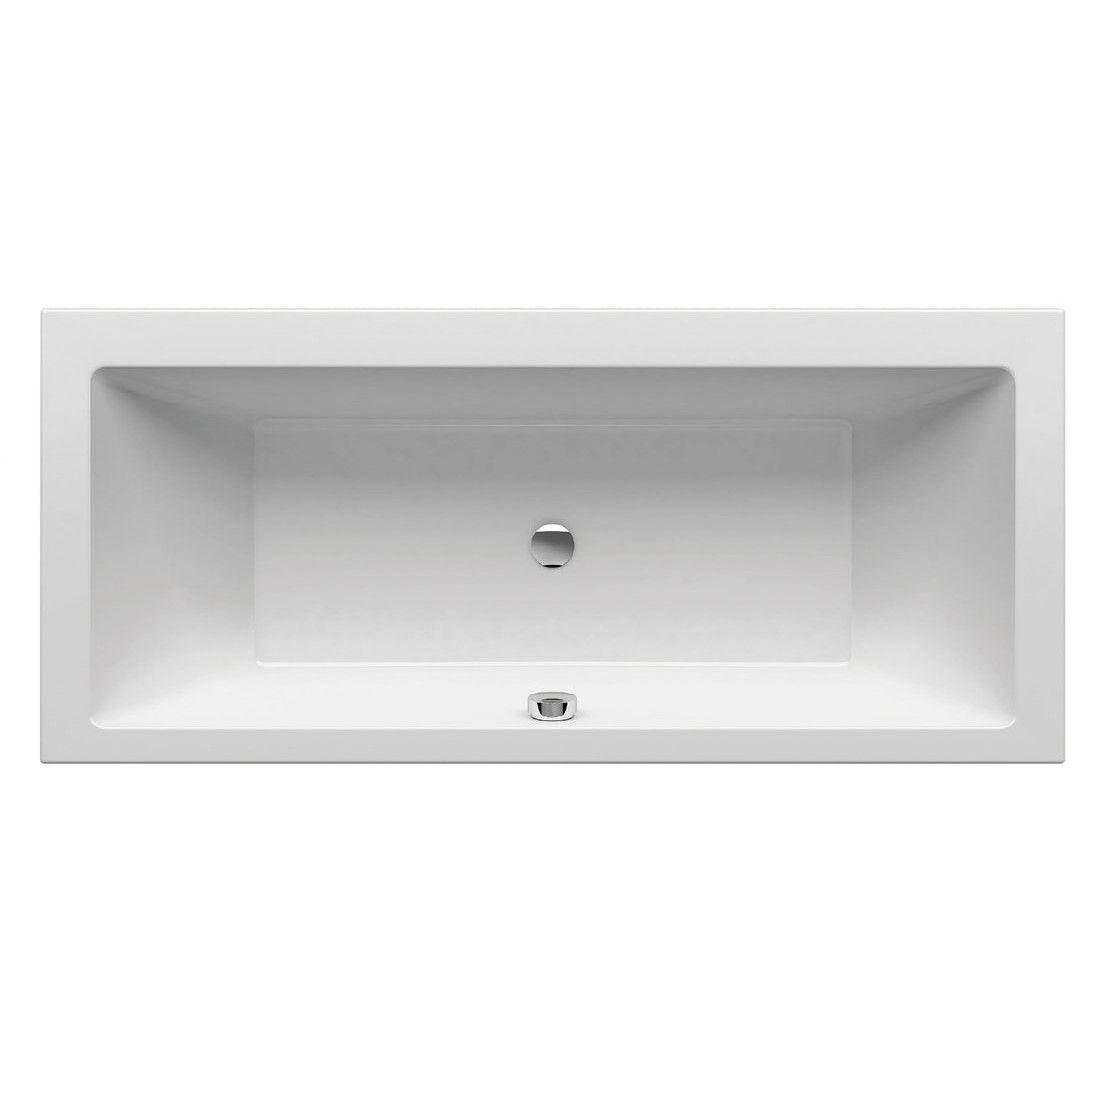 Прямоугольная ванна Ravak Formy 01 170x75 слив по центру ФОТО